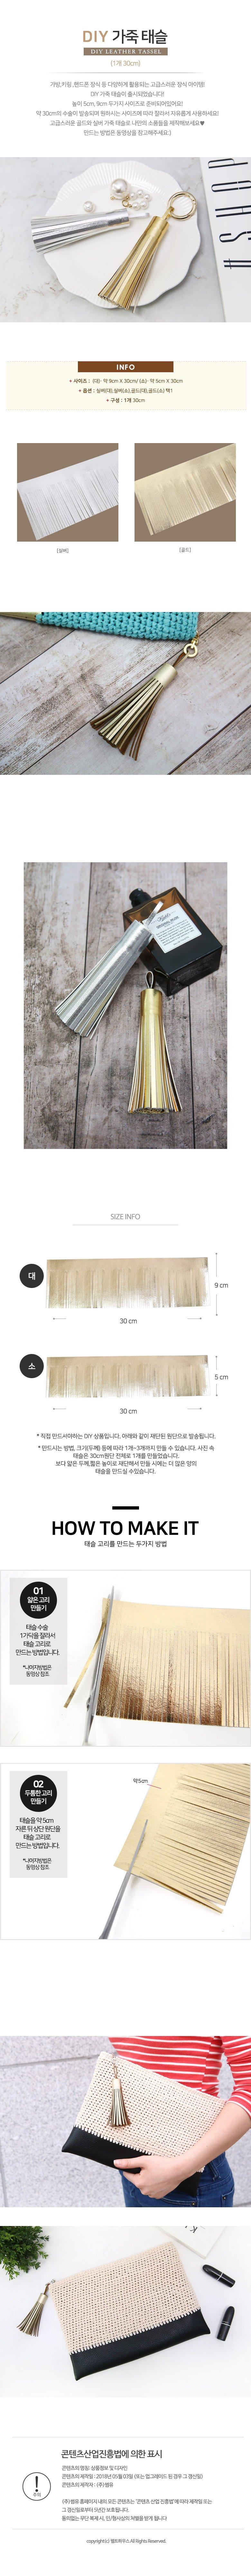 DIY 가죽 태슬 - 펠트하우스, 2,000원, 펠트공예, 장식/단추/라벨